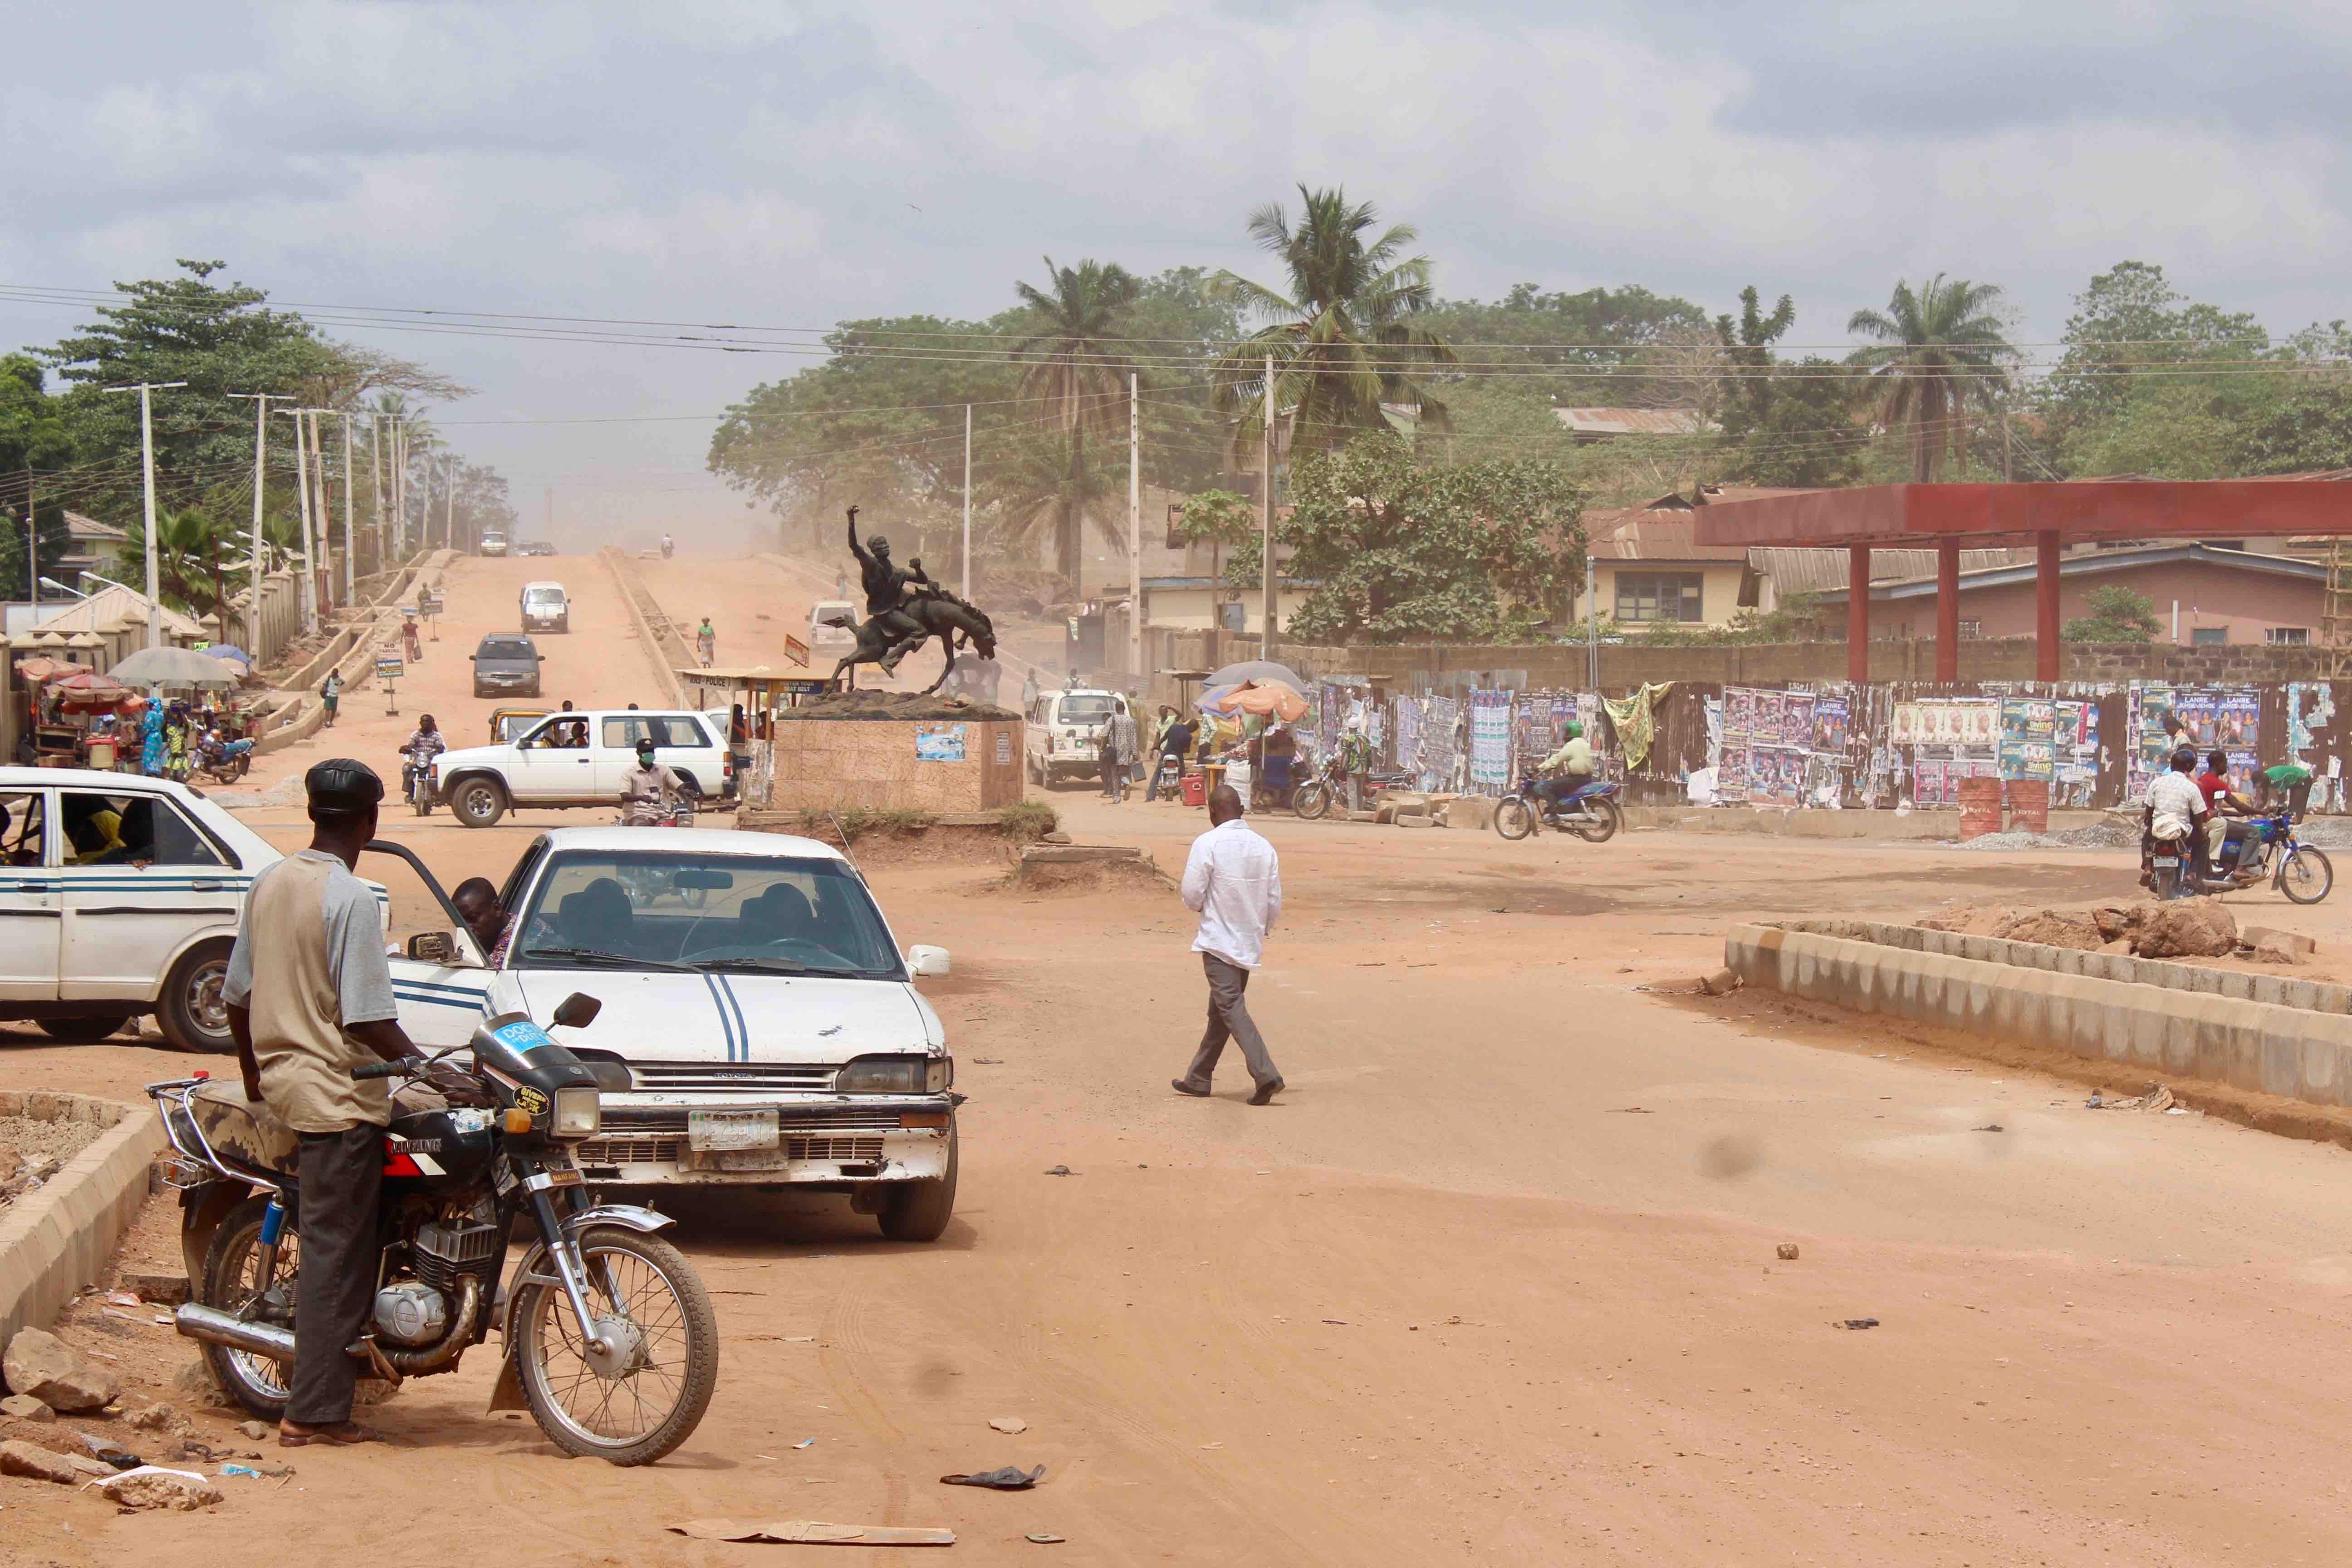 Total Garden Road, Agodi, Ibadan, Oyo State, Nigeria. #JujuFilms